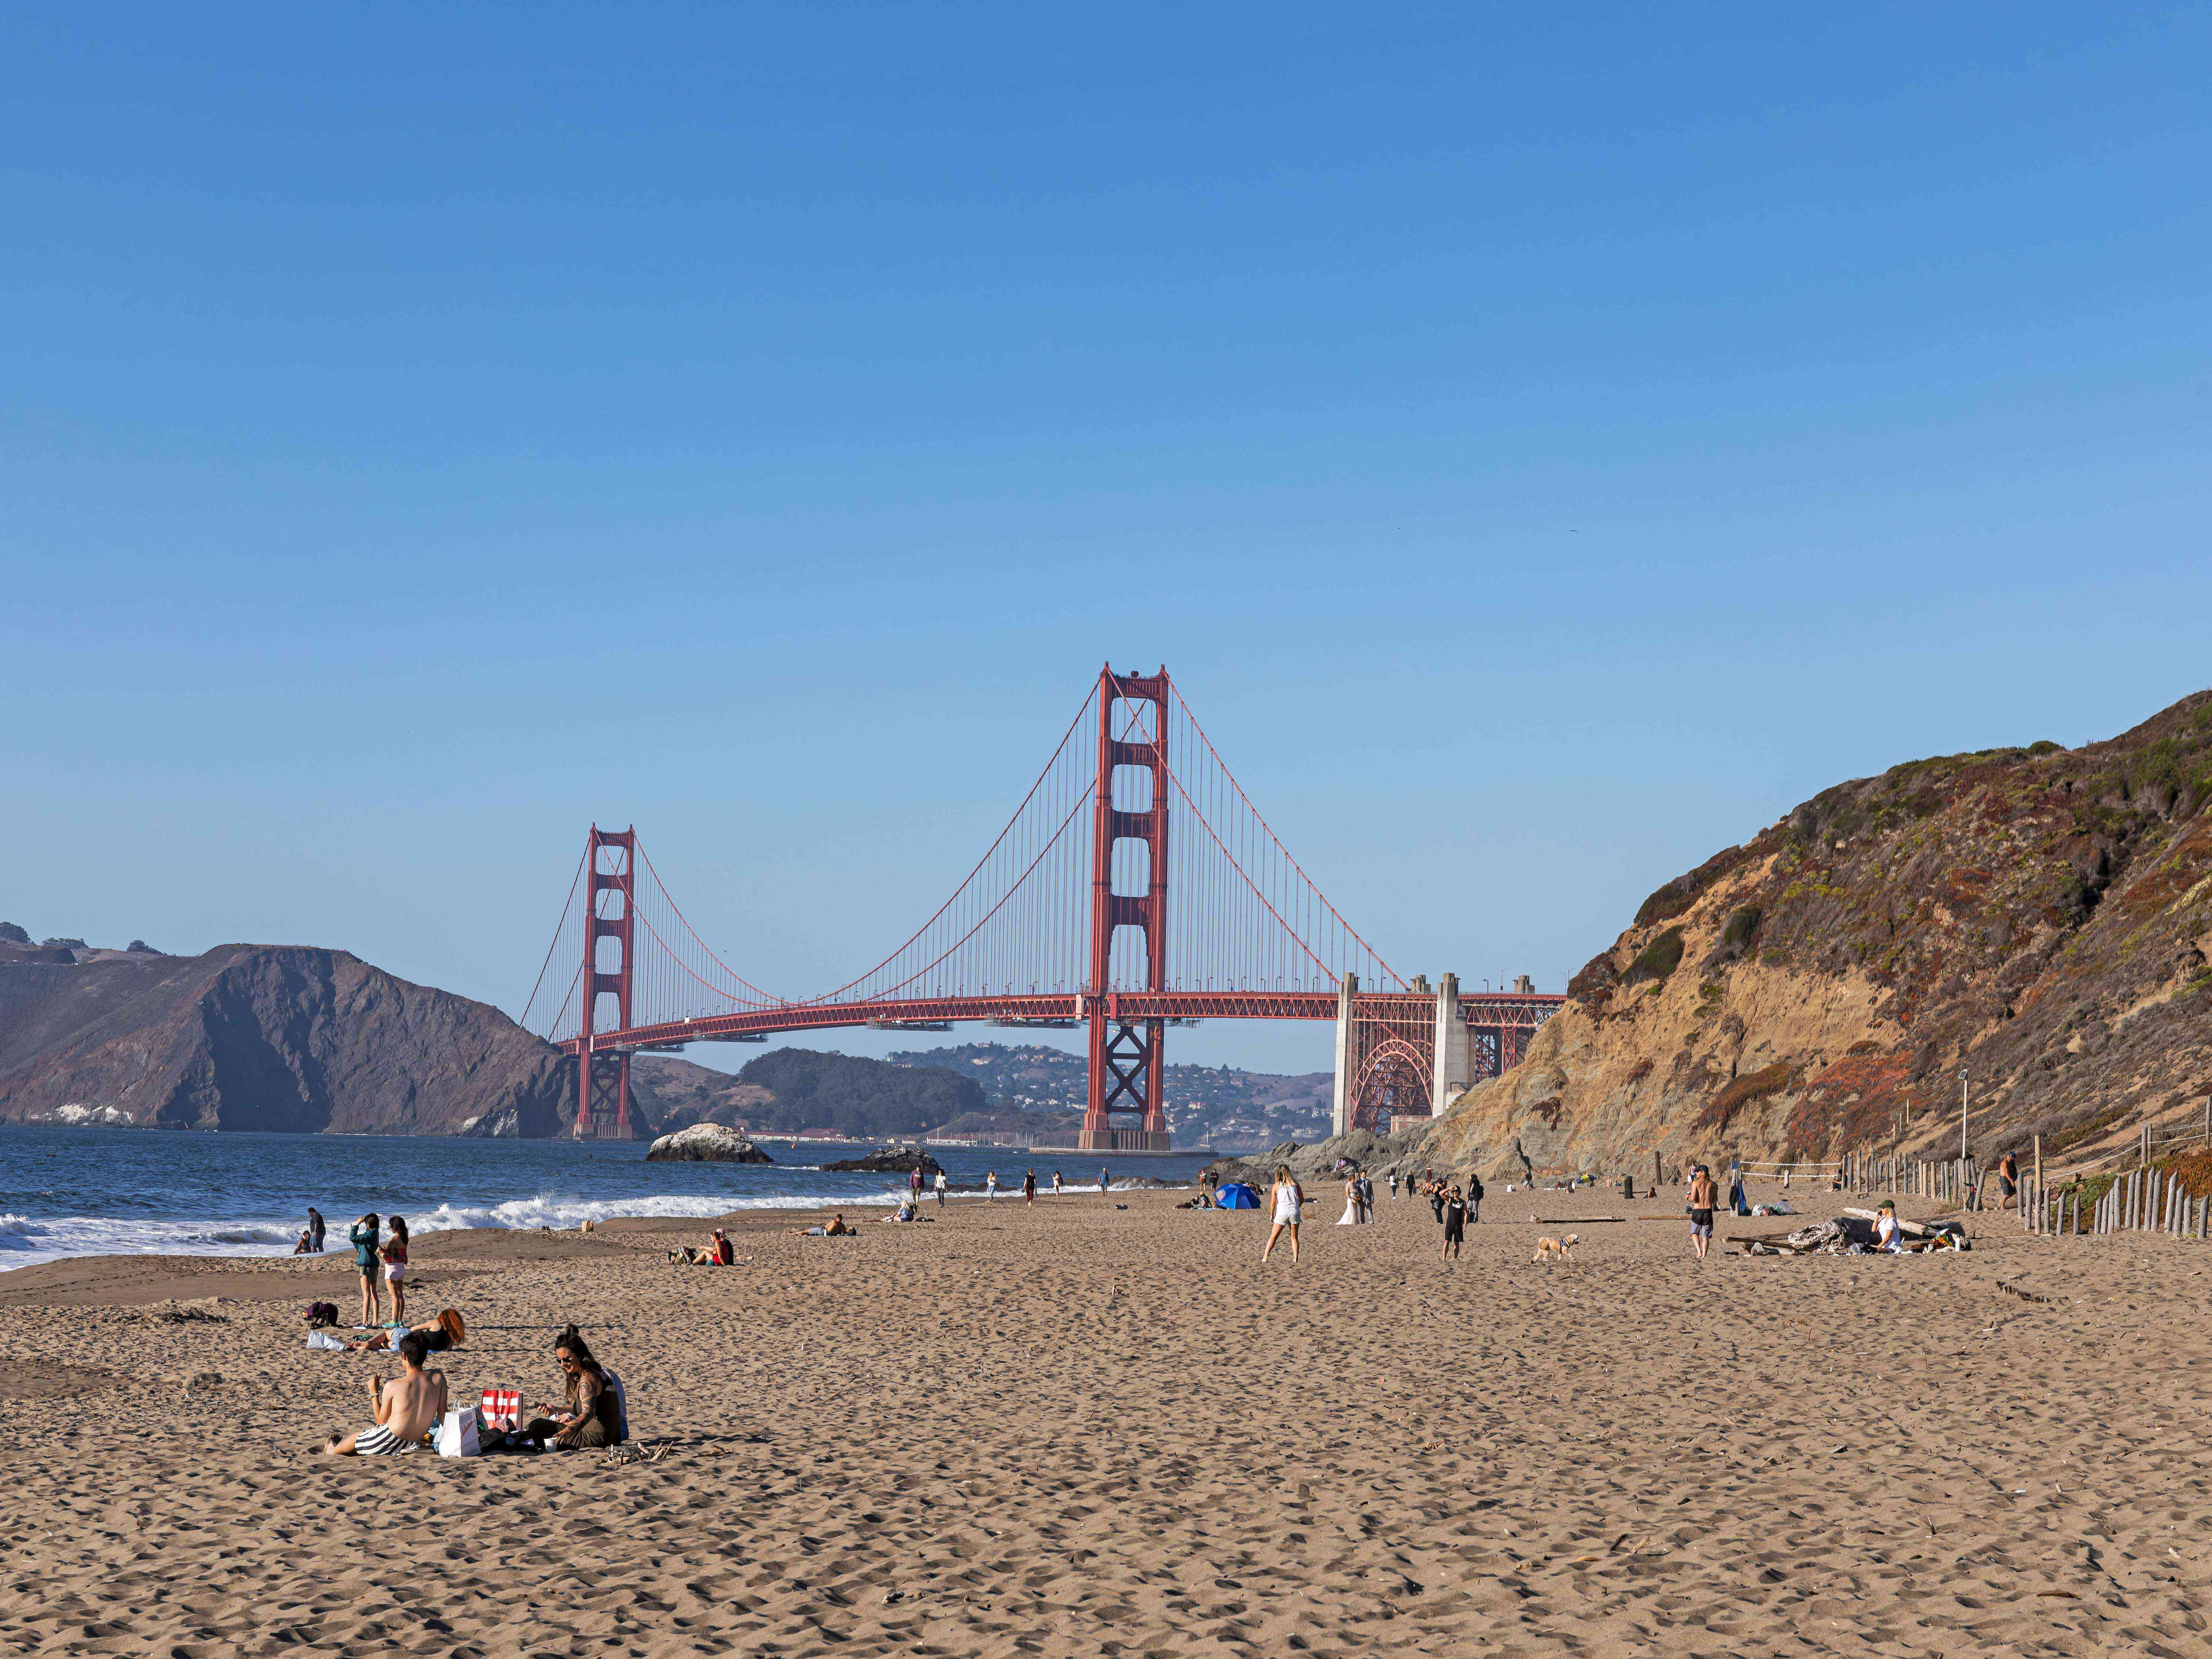 Baker Beach in San Francisco